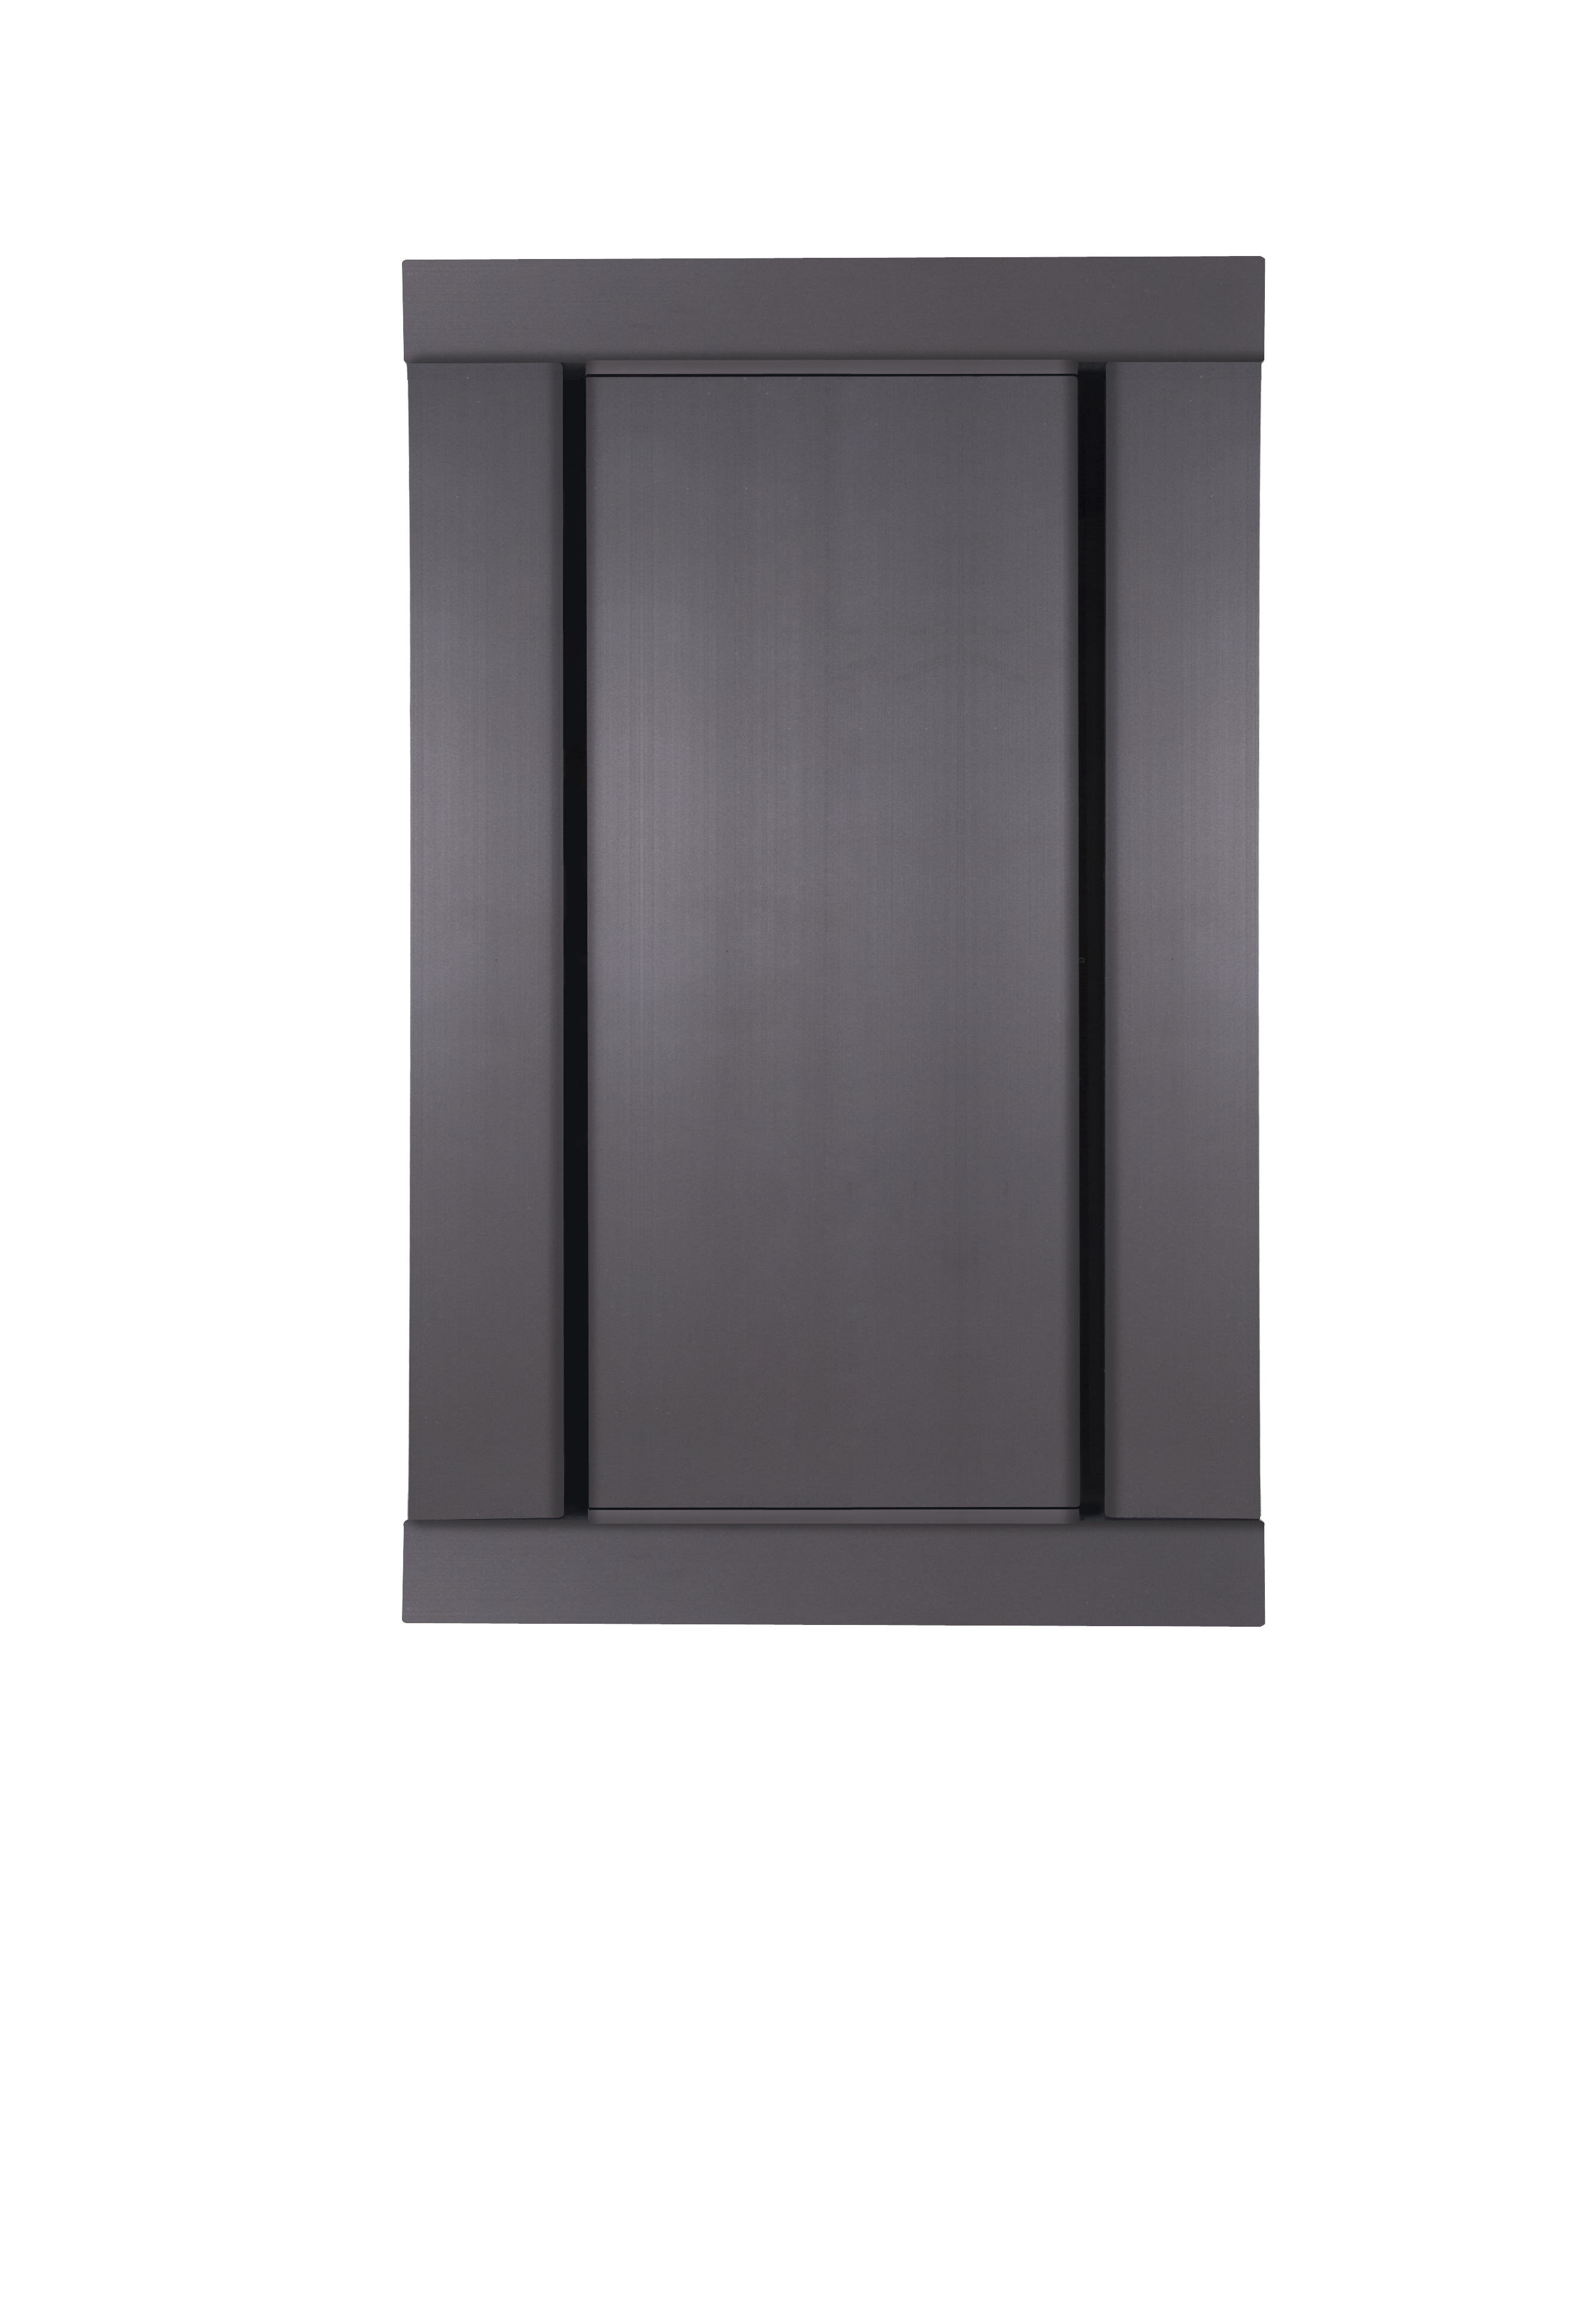 HPX-600 - StraightOn Closed